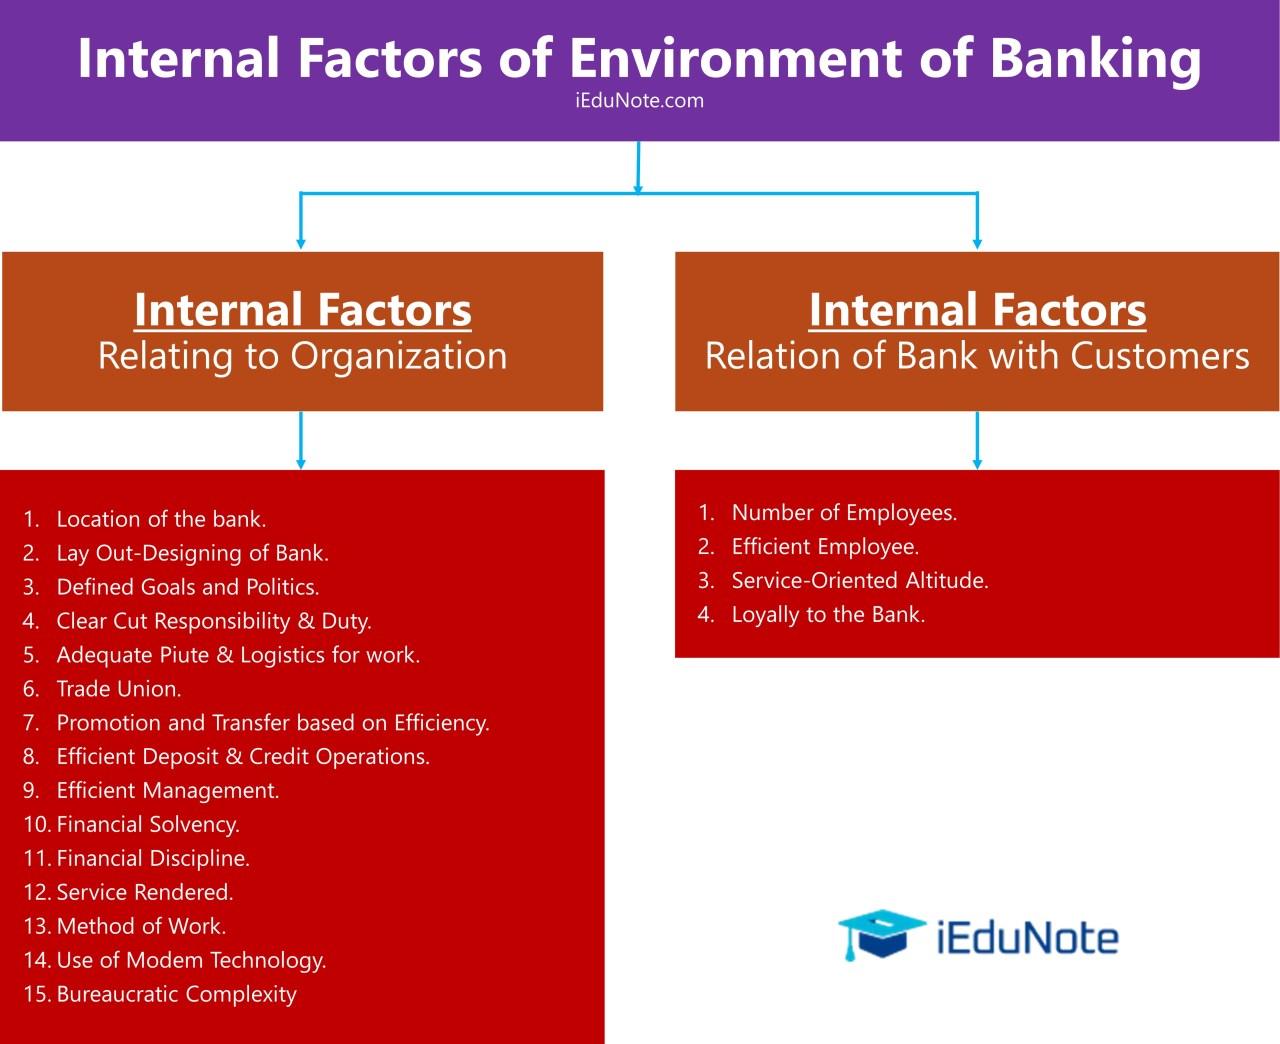 internal factors of banking environment